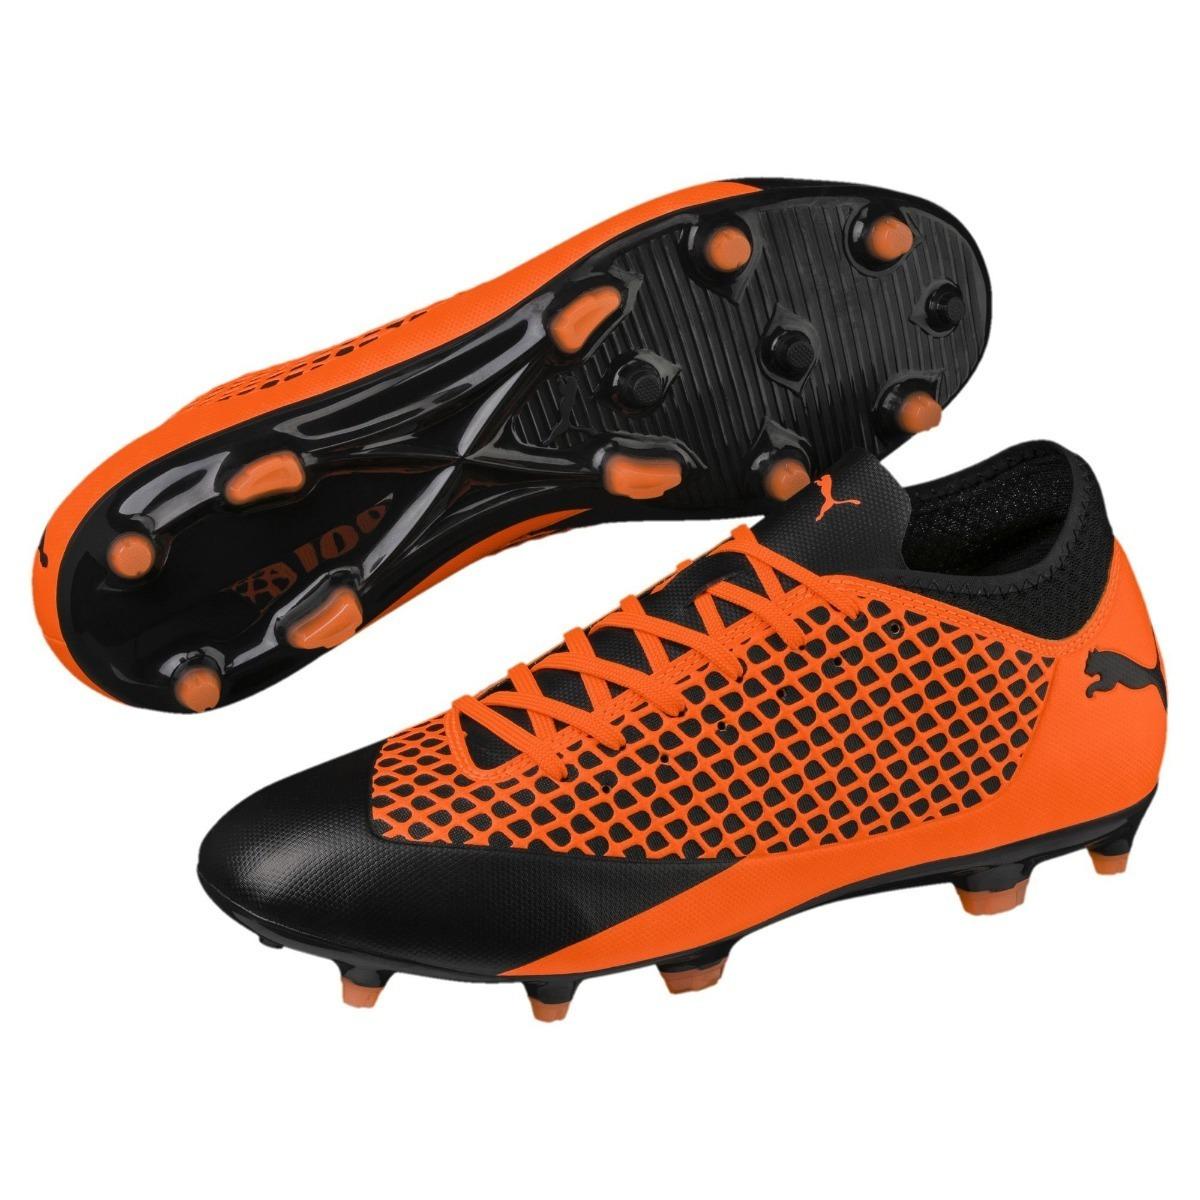 20d131925 botas puma future 2.4 taquete hombre negros original futbol. Cargando zoom.